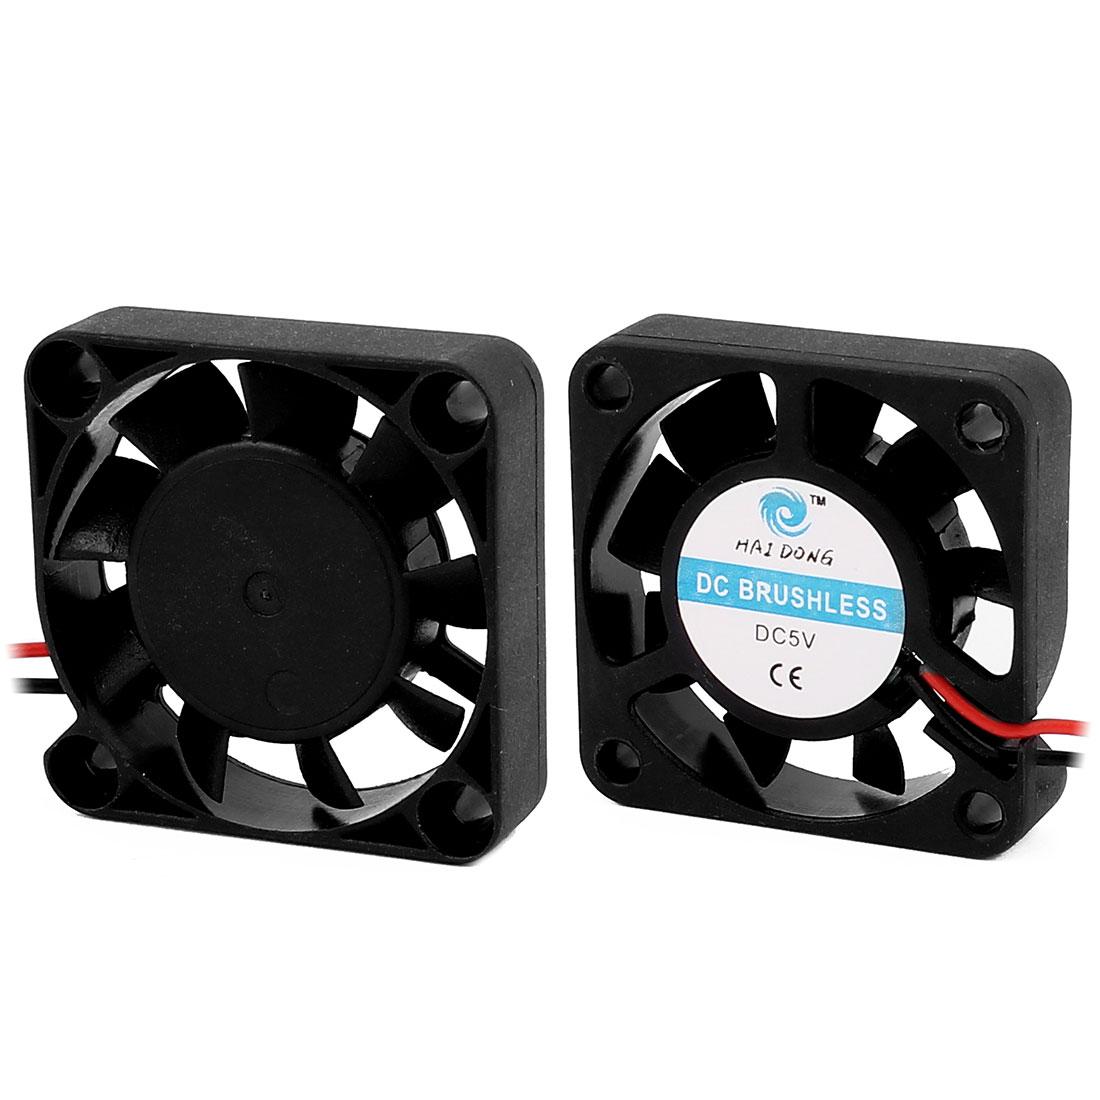 2Pcs 40 x 40 x 10mm 5V0.14A DC Heatsink Silent Cooling Case Fan Black